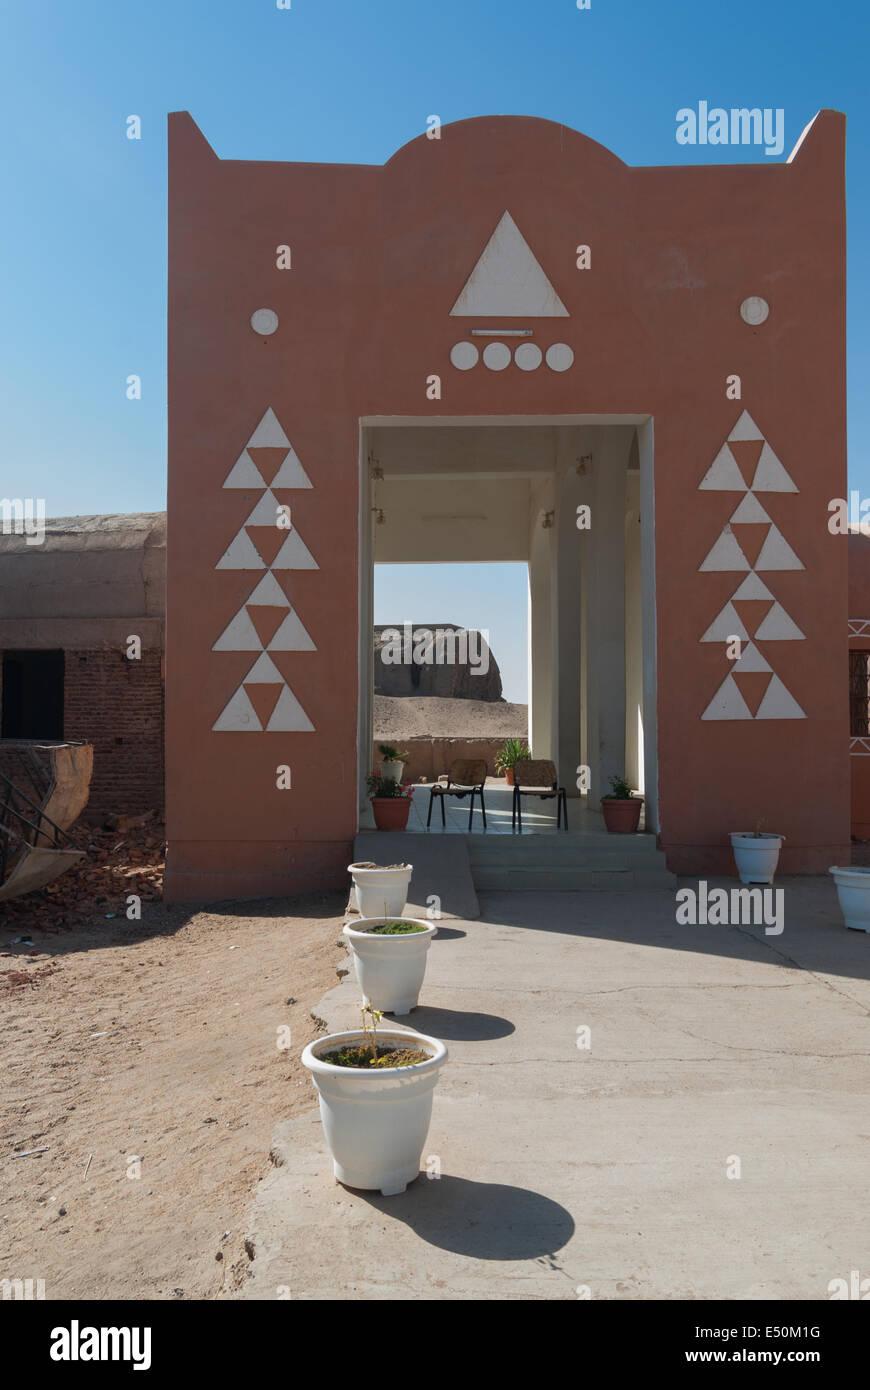 Kerma Civilization Complex Museum and Western Deffufa (visible through 'door'), Kerma, northern Sudan - Stock Image